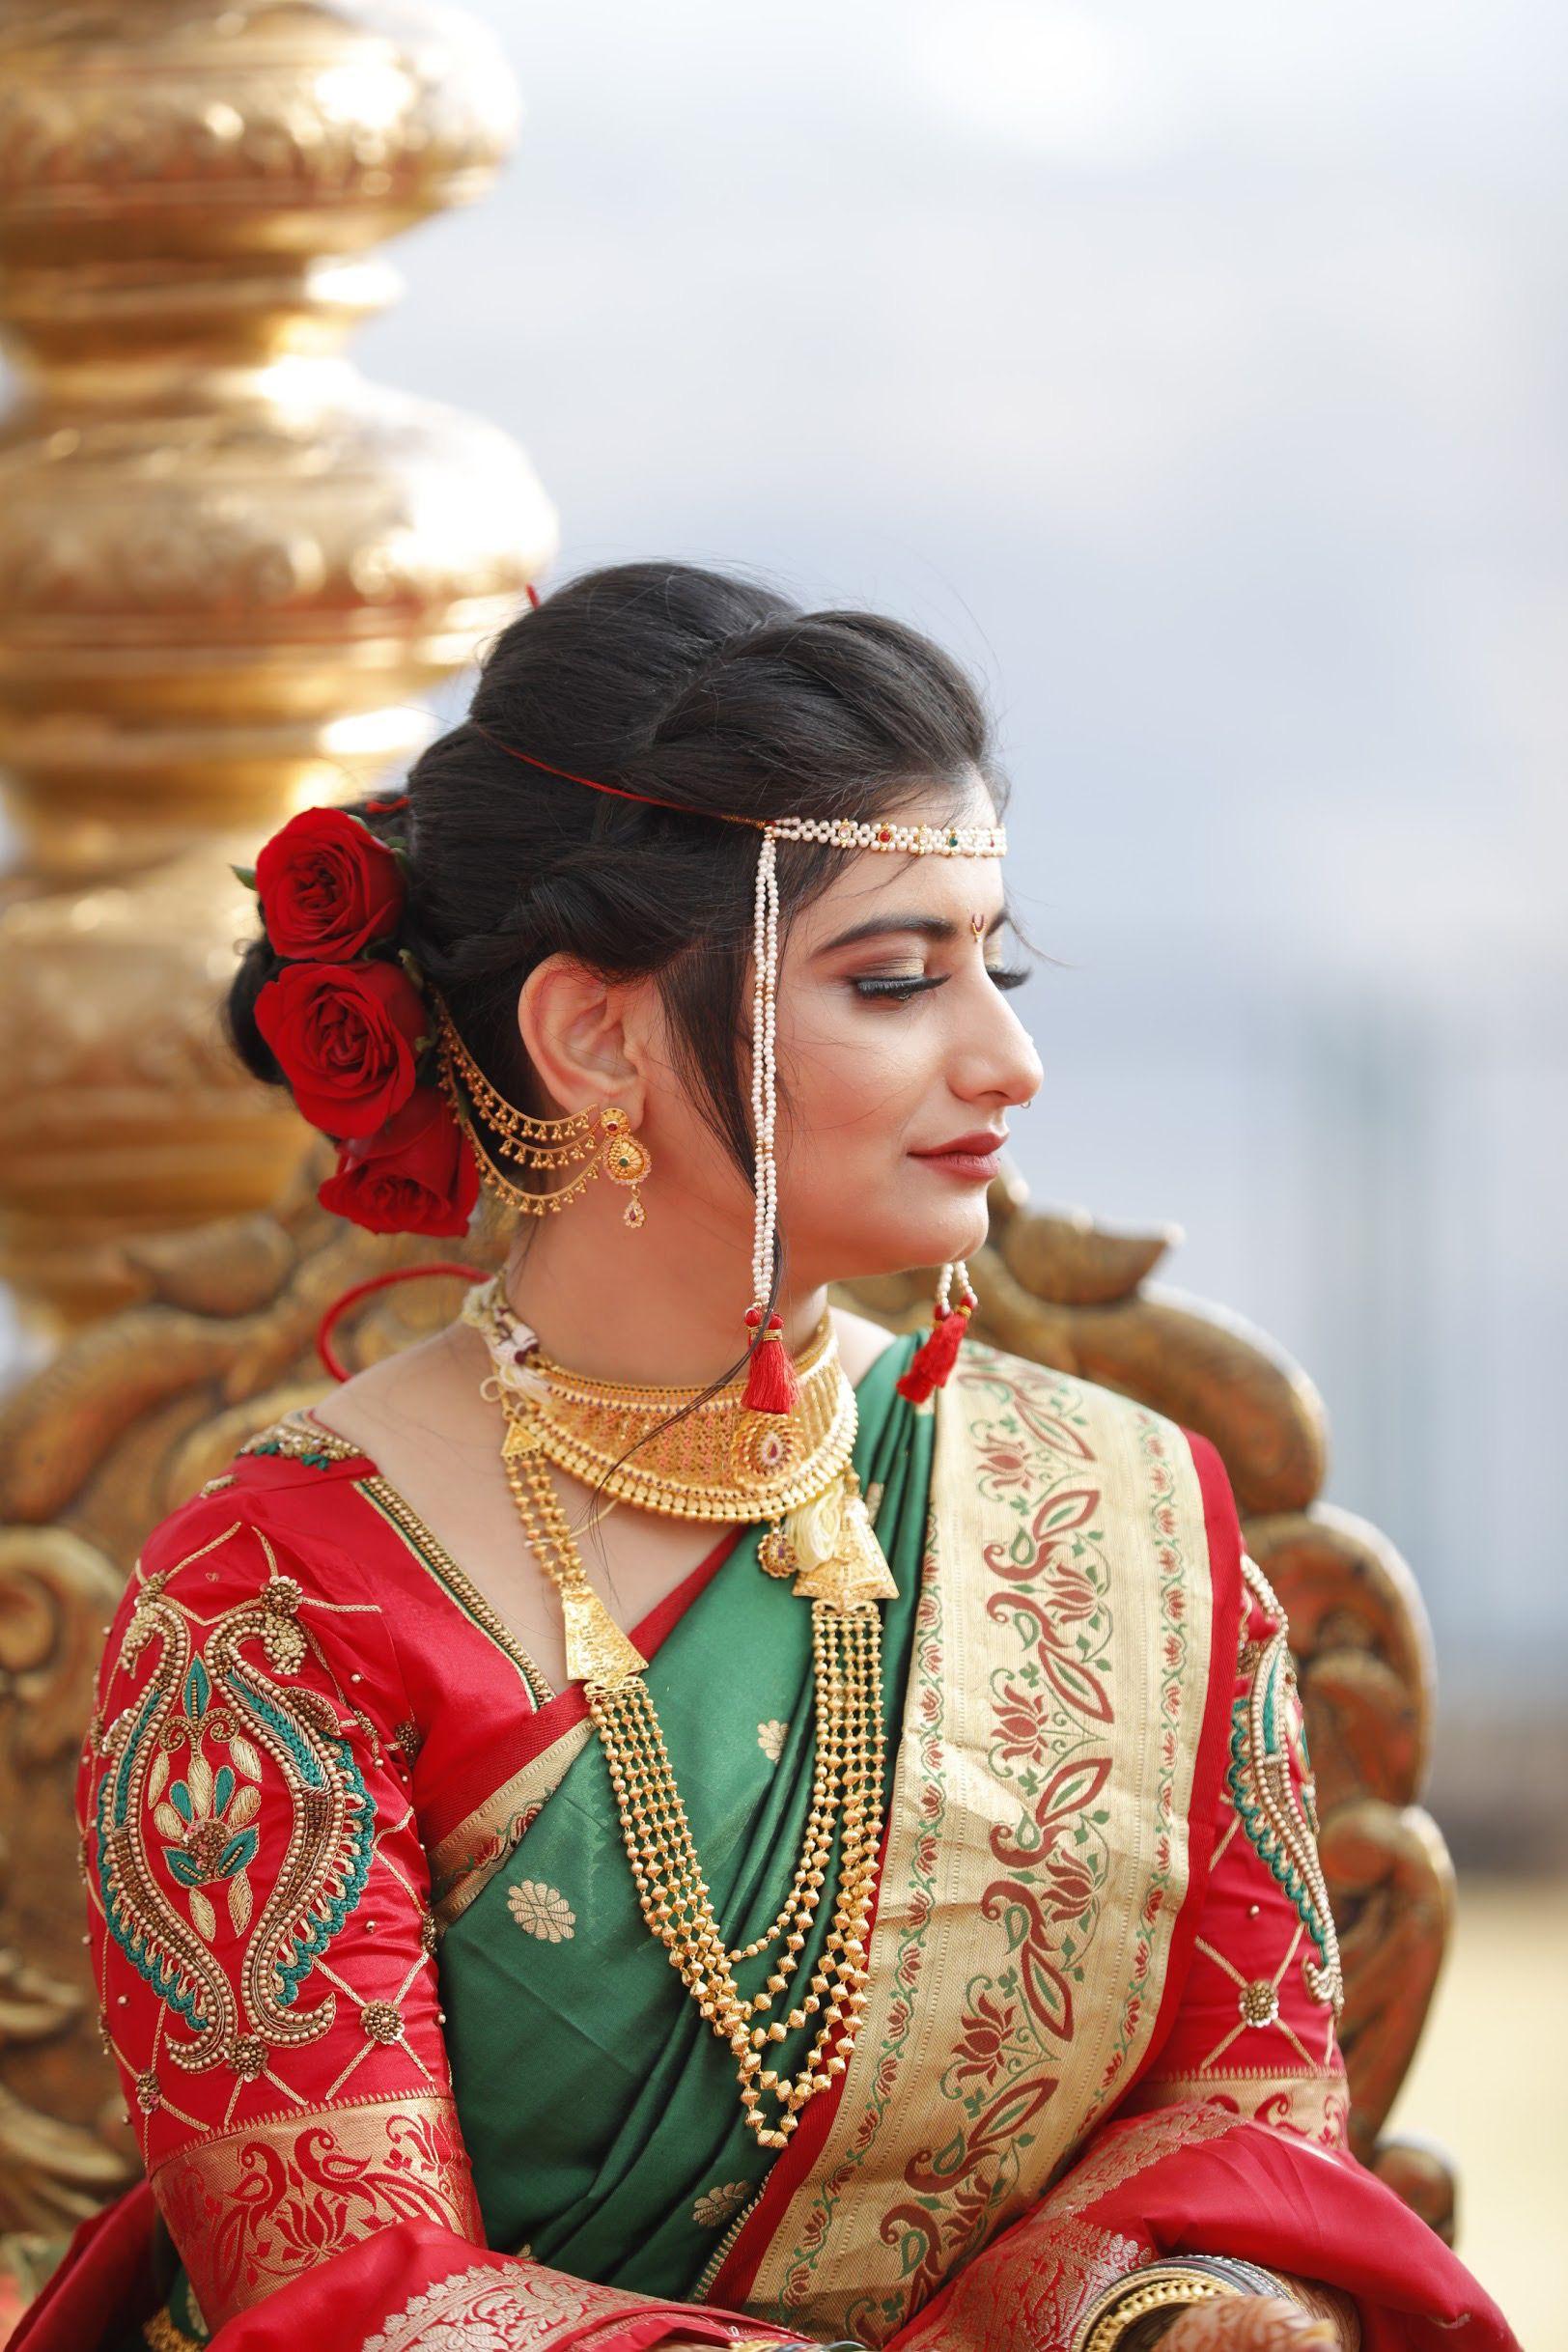 marathi #marathibride #makeup #hairstyles #flowerhairclips